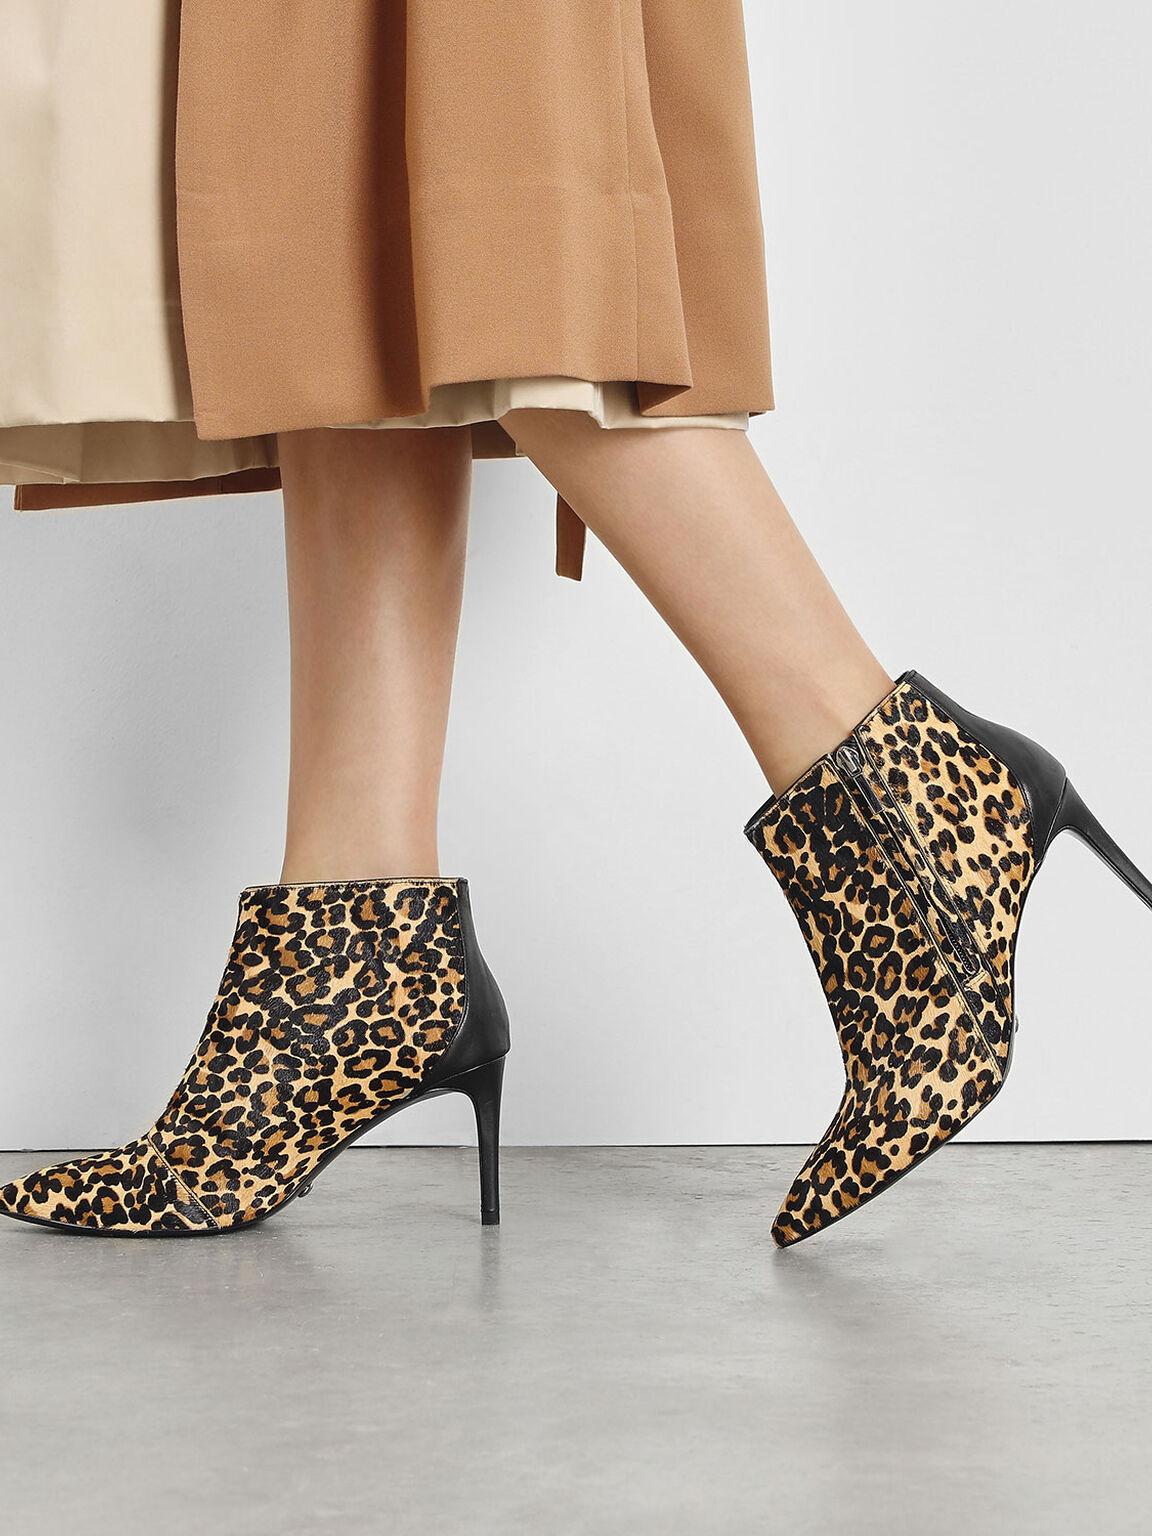 Pony Hair Leopard Print Boots, Multi, hi-res